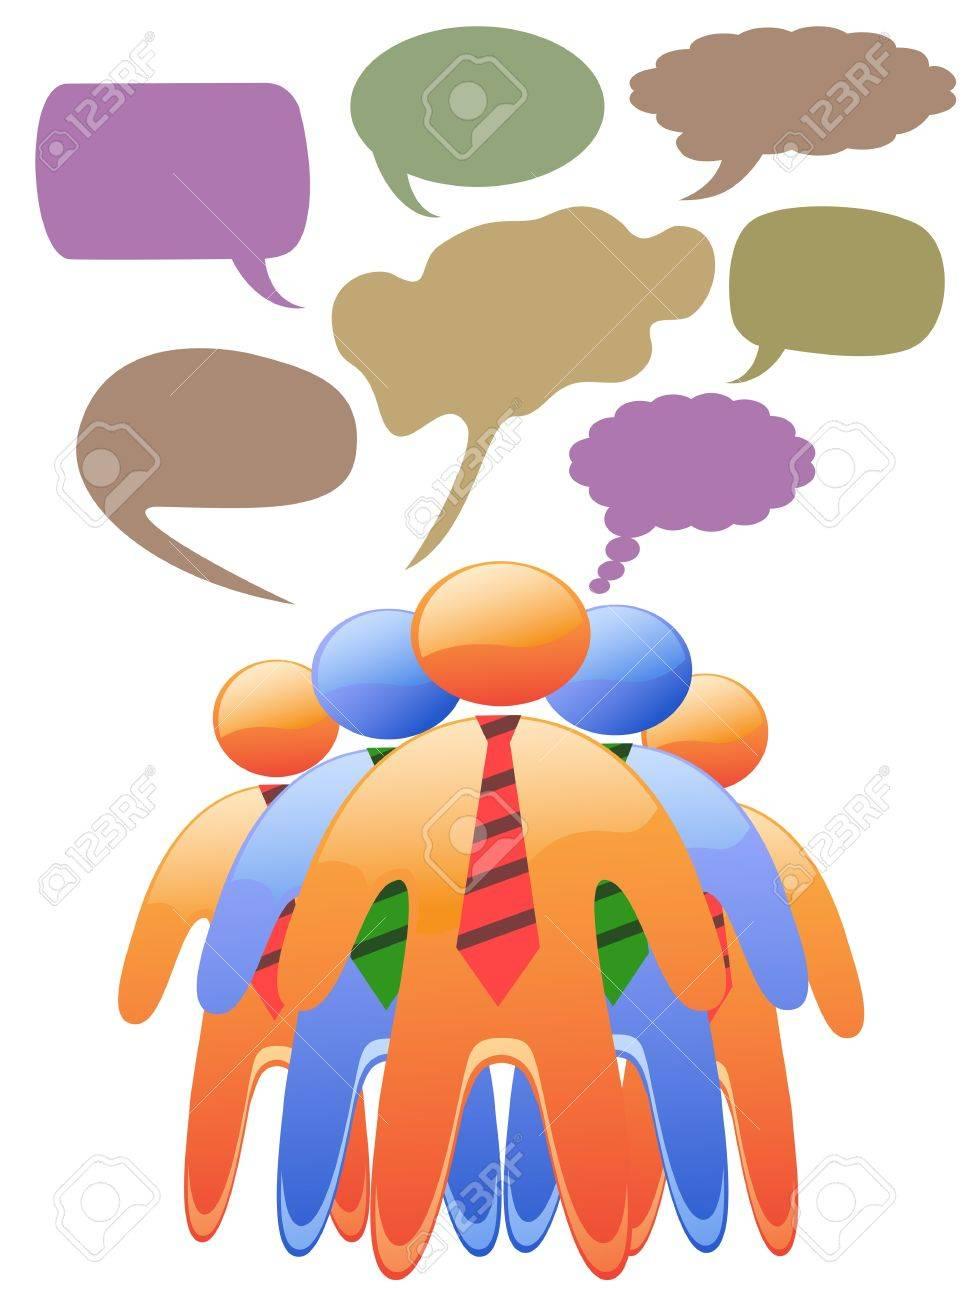 social symbol people talk in color speech bubbles Stock Vector - 9883019